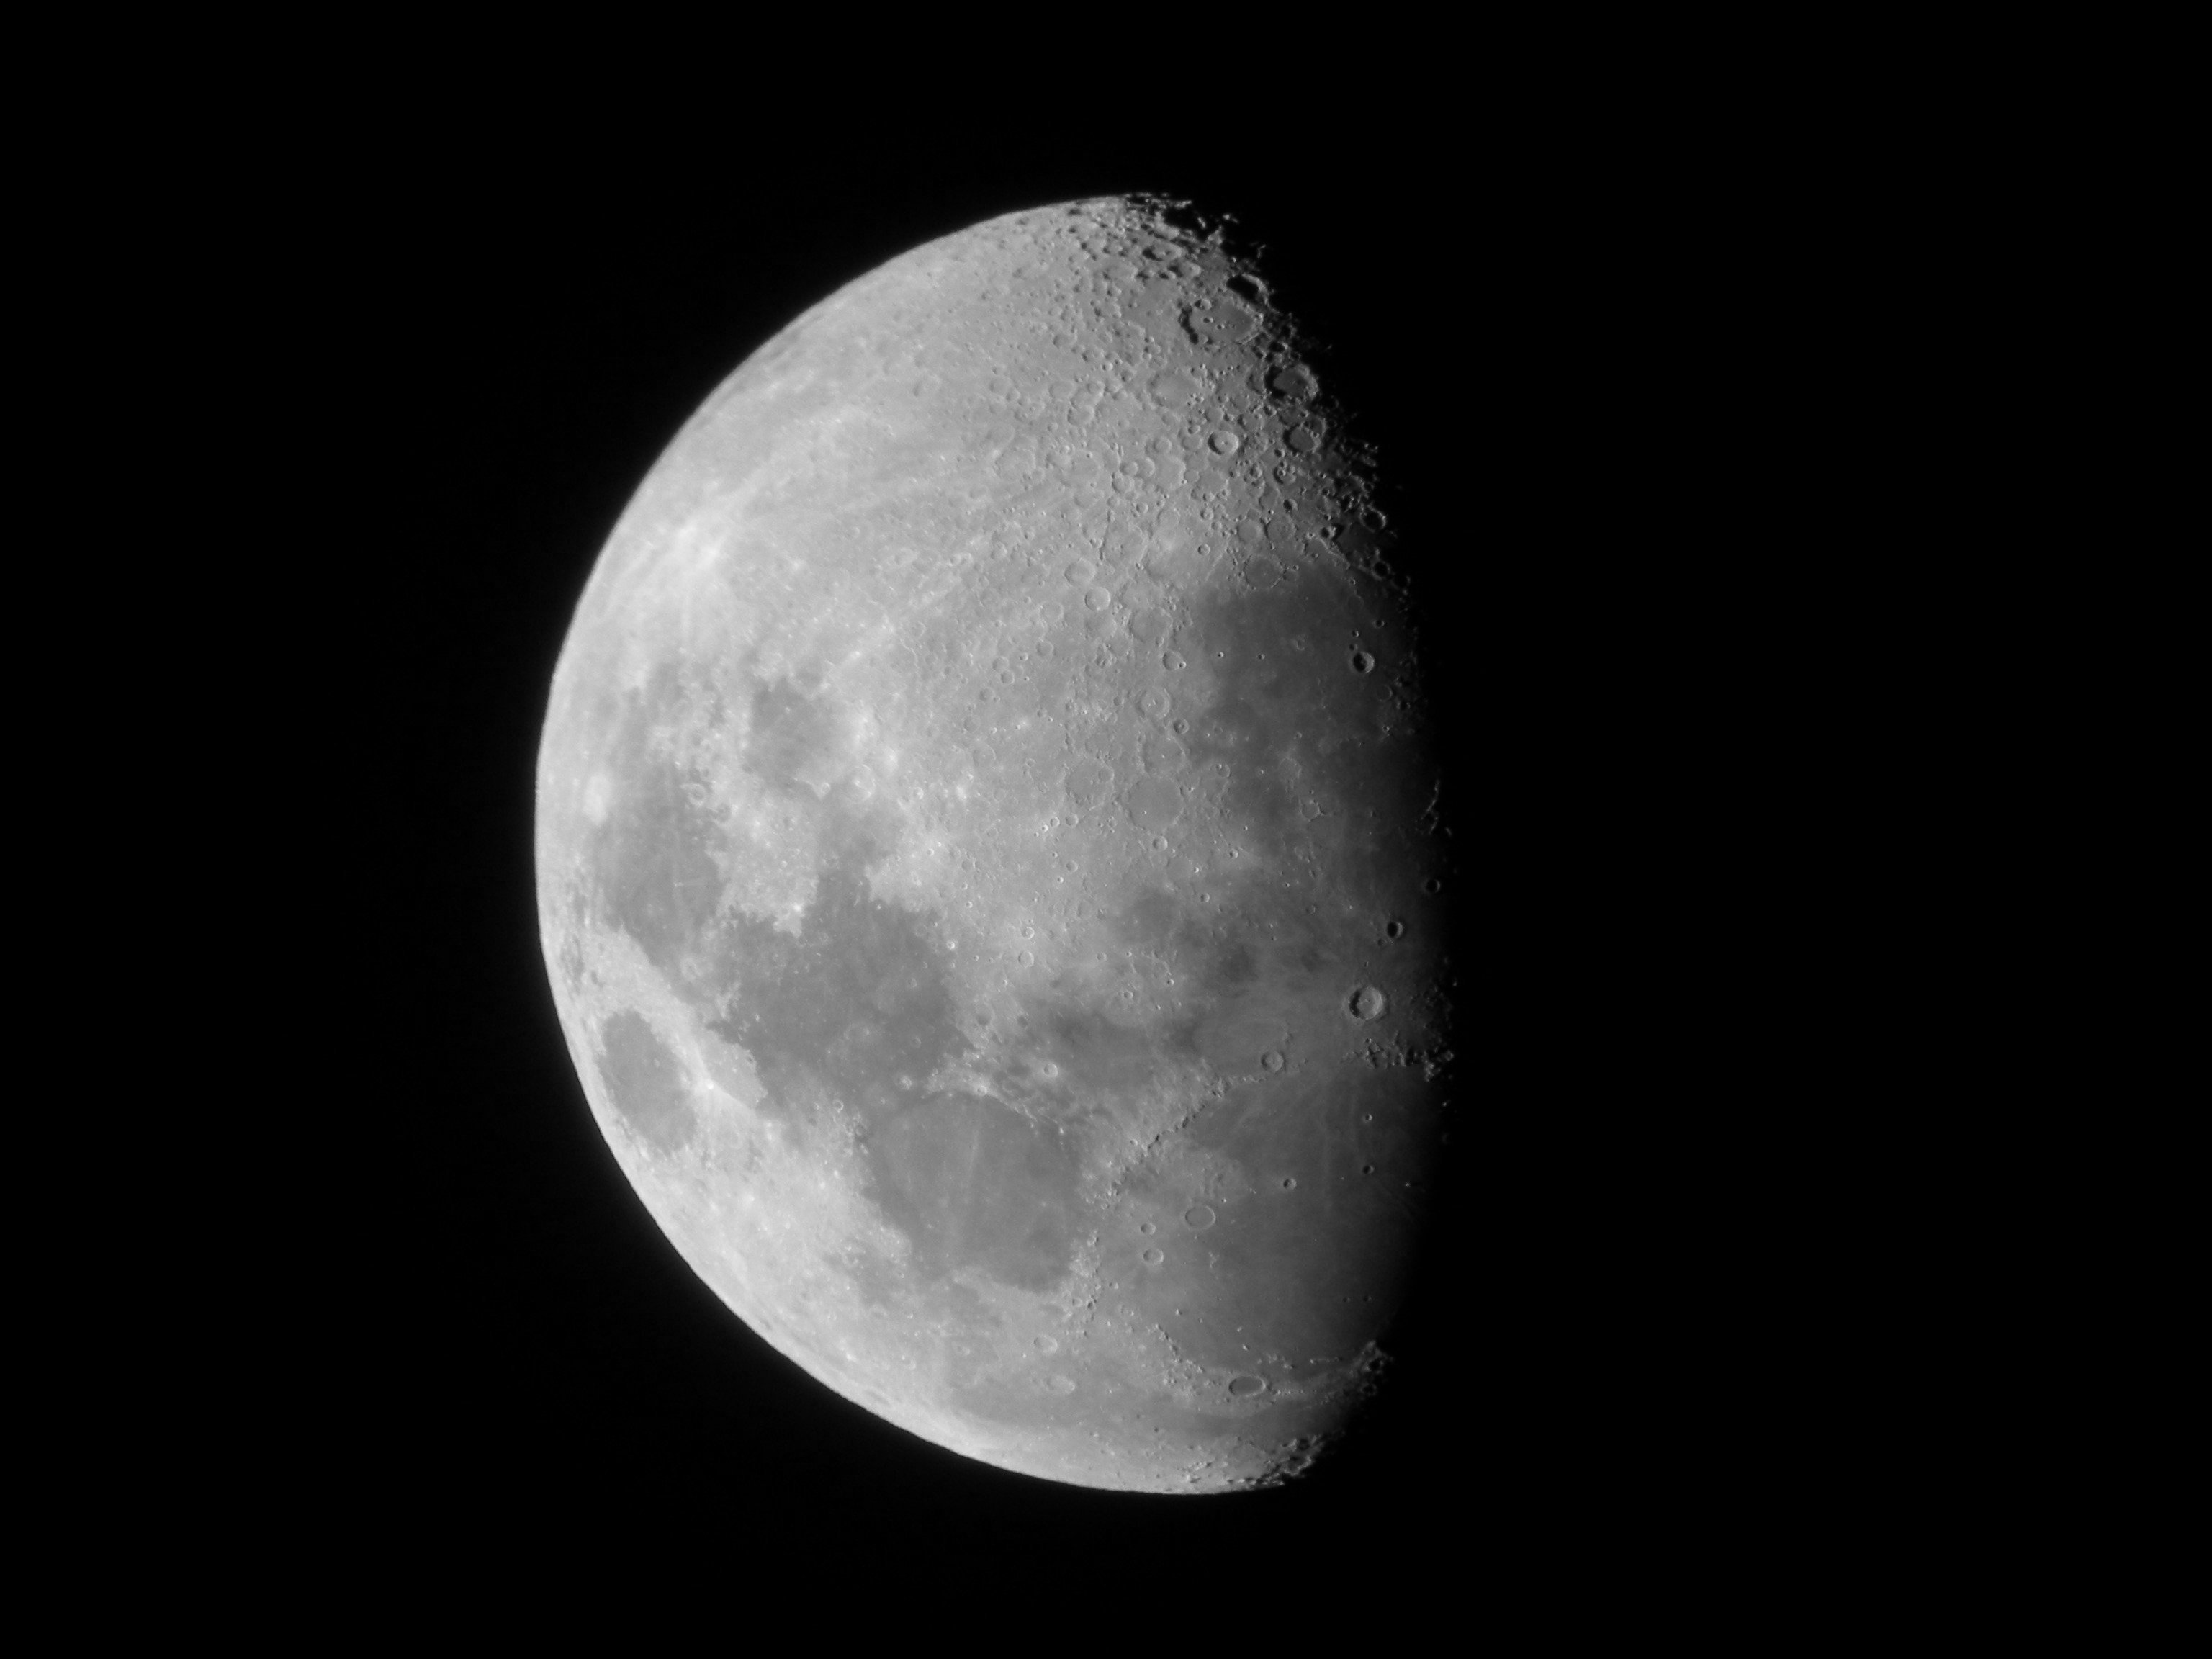 Luna for Manuale termostato luna in 20 fi